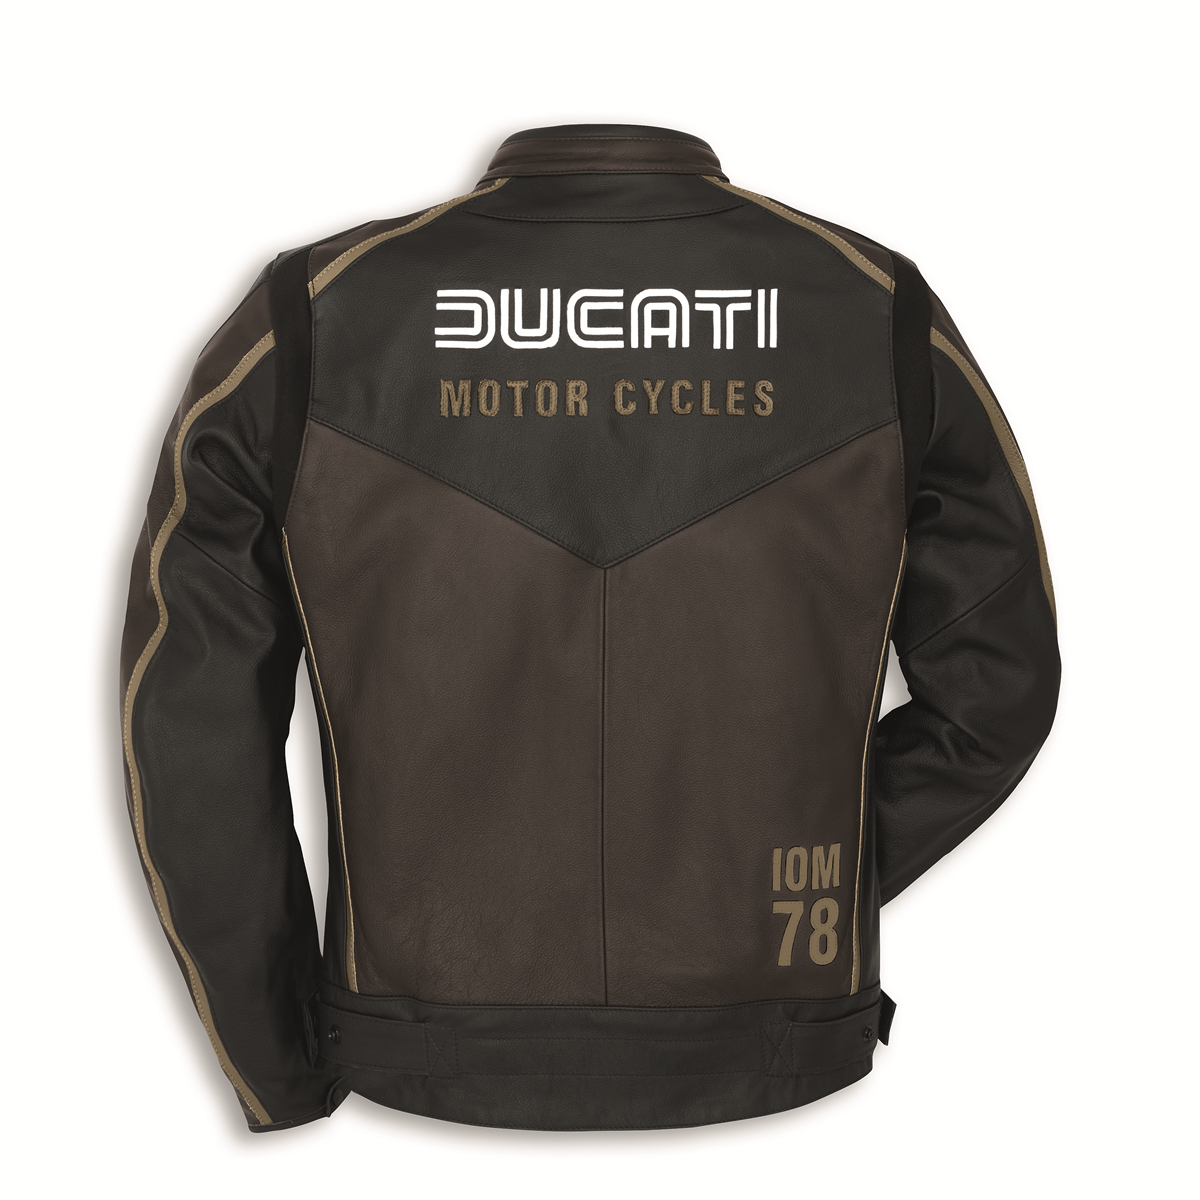 blouson ducati iom78 c1 cuir s team motos. Black Bedroom Furniture Sets. Home Design Ideas